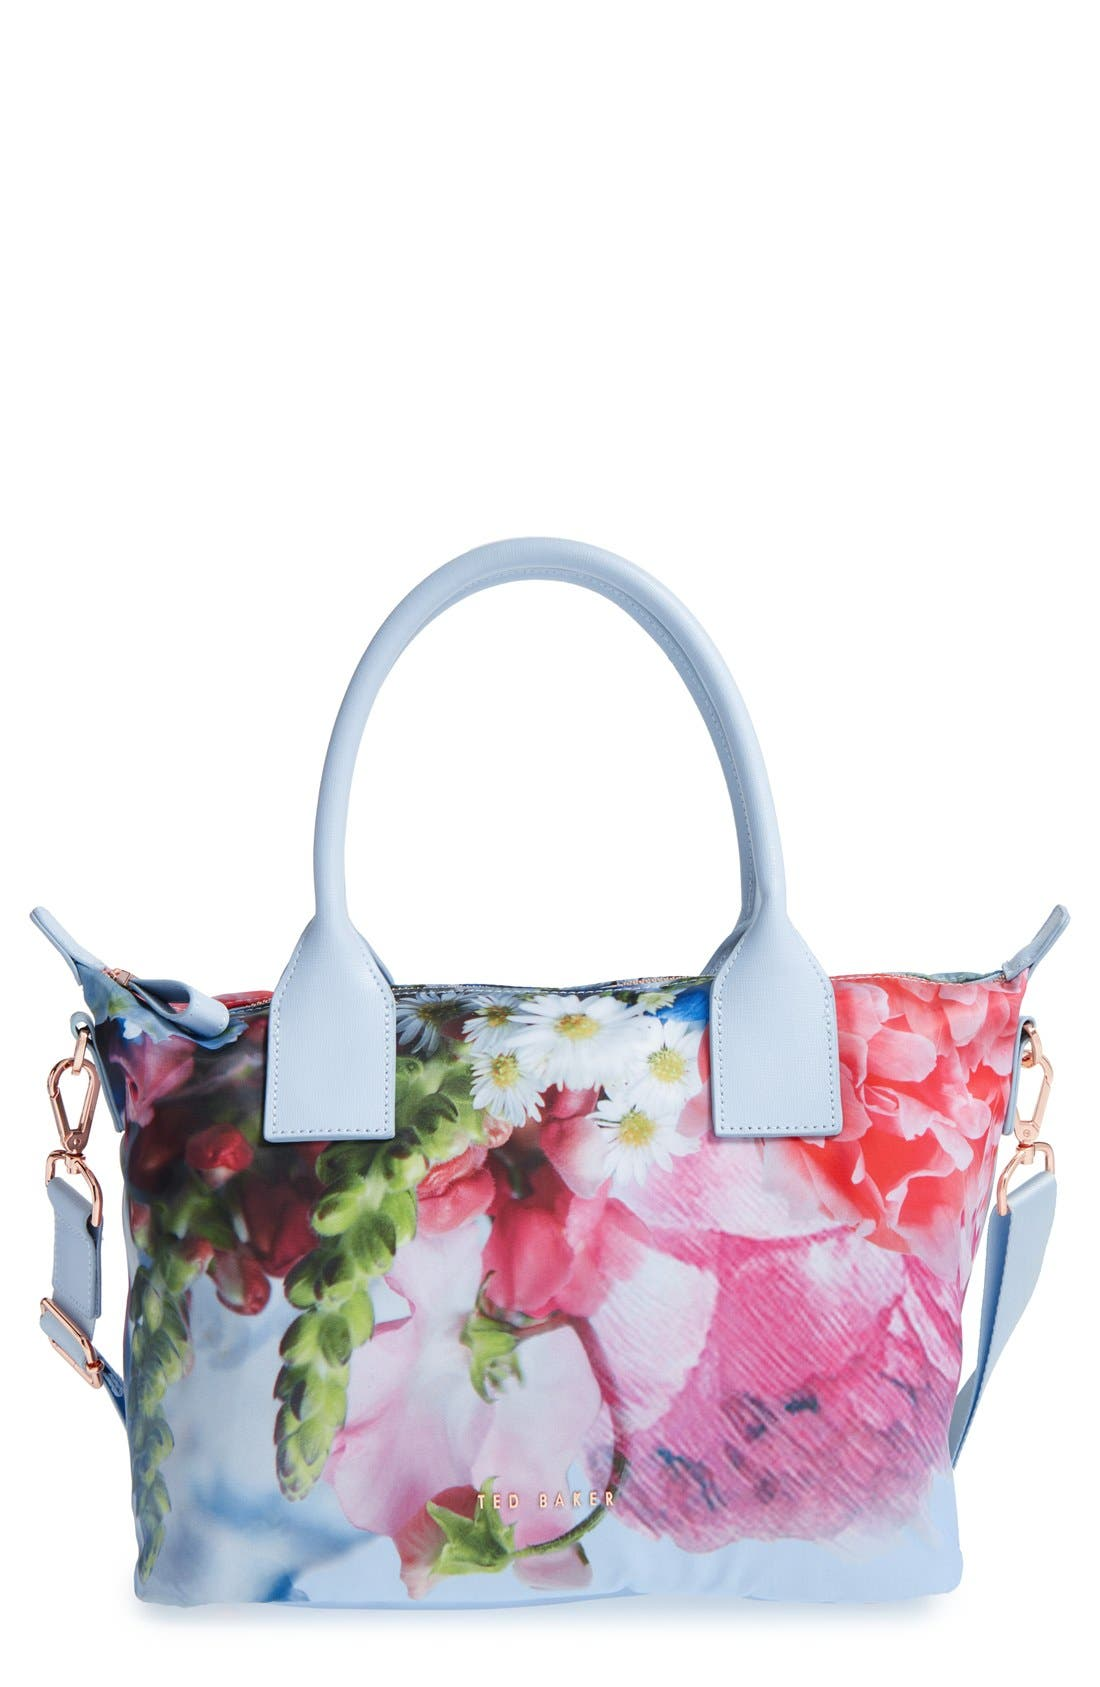 Main Image - Ted Baker London 'Small Vlora' Floral Crossbody Satchel